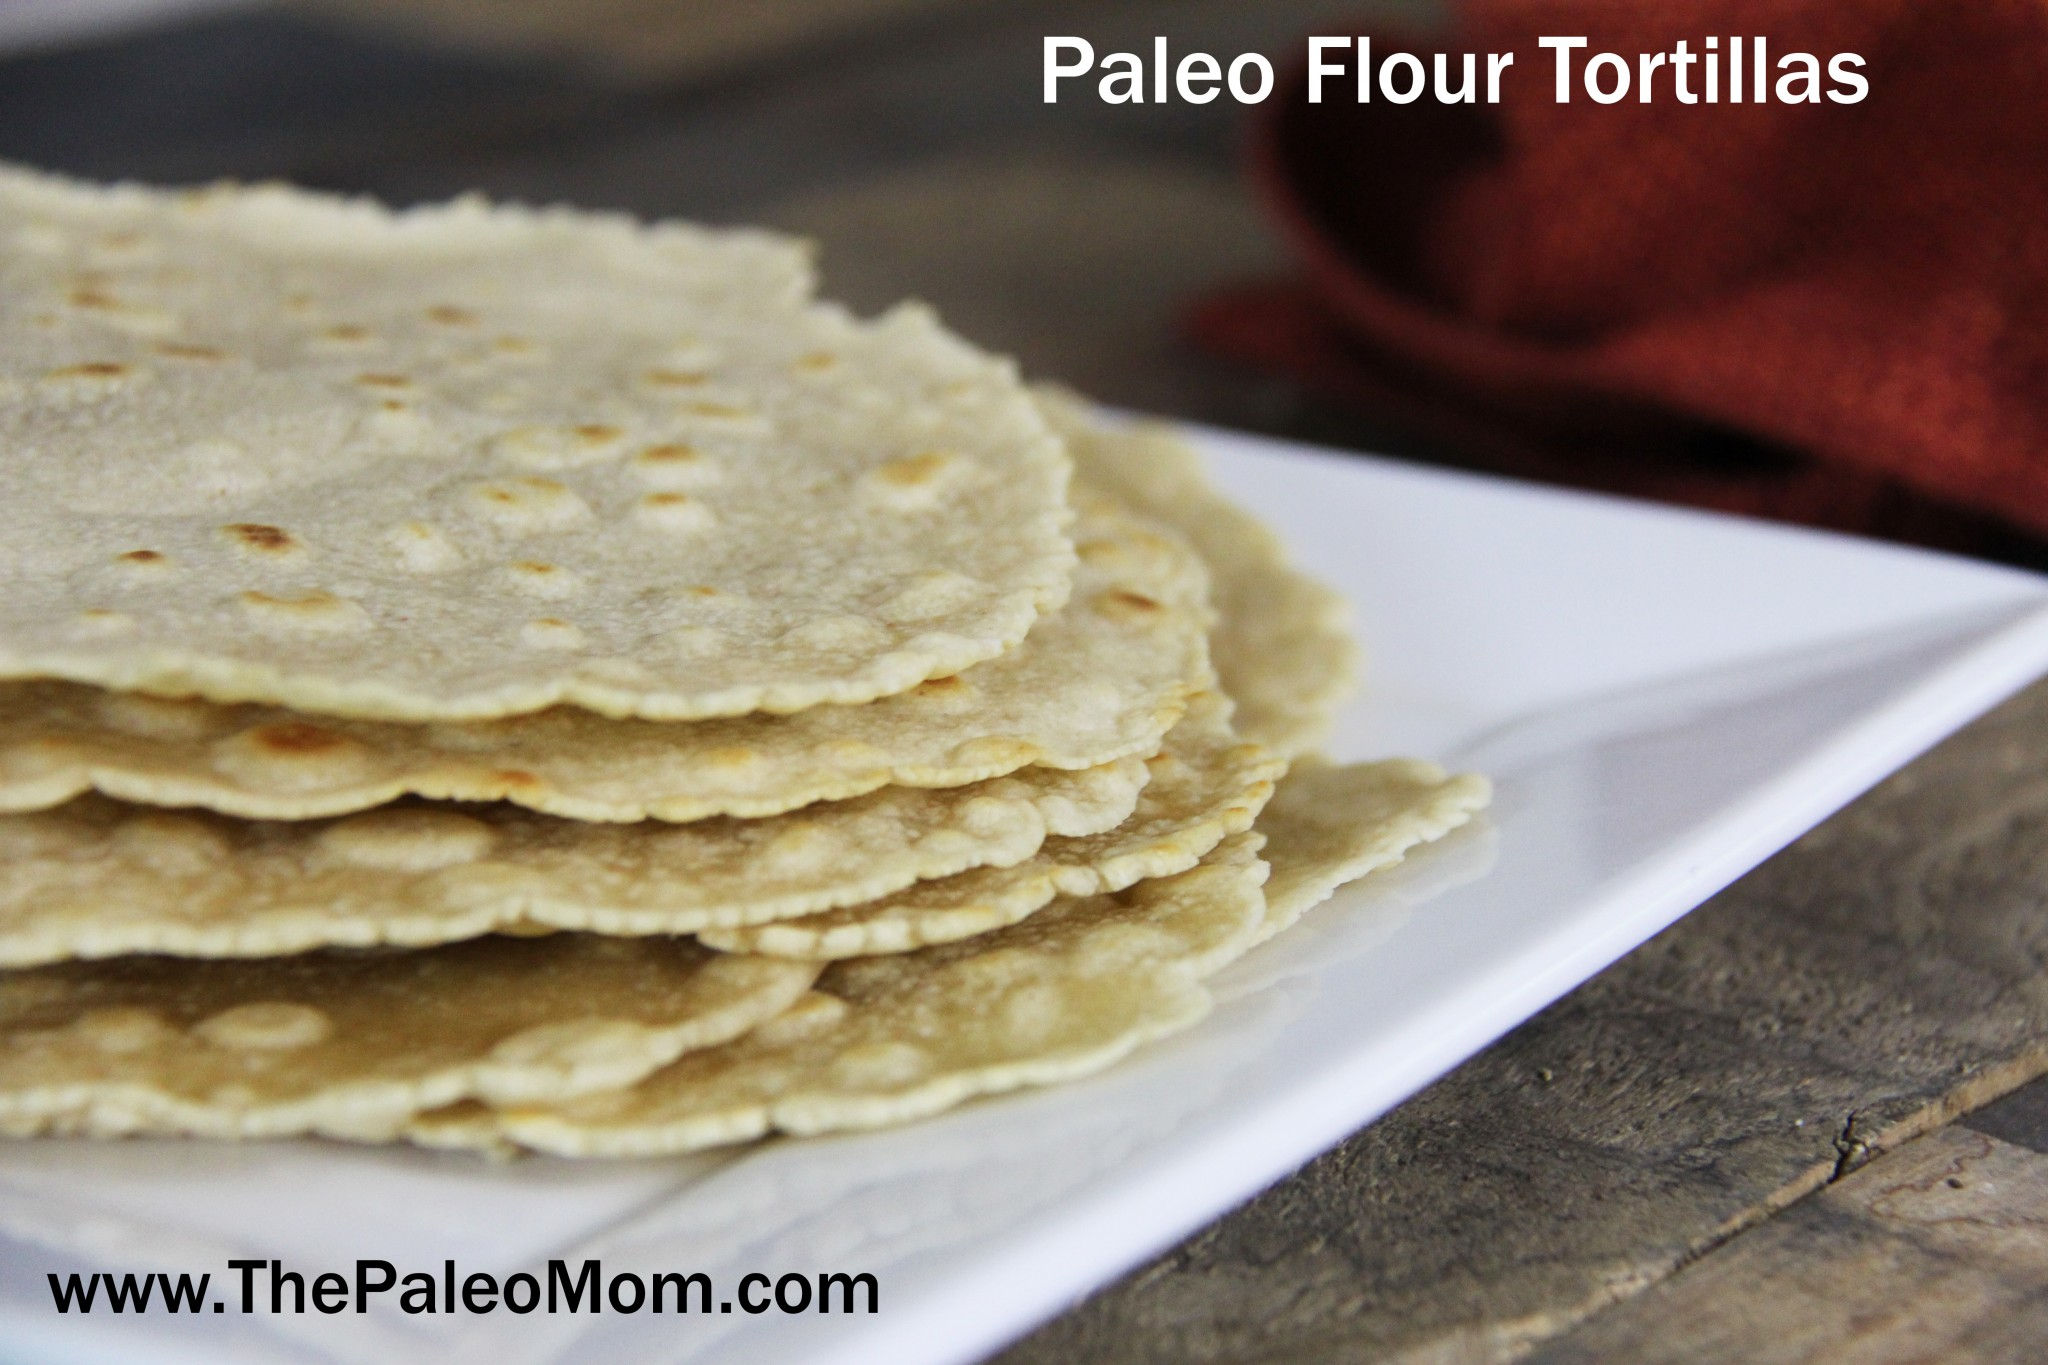 Paleo Flour Tortillas from The Paleo Mom